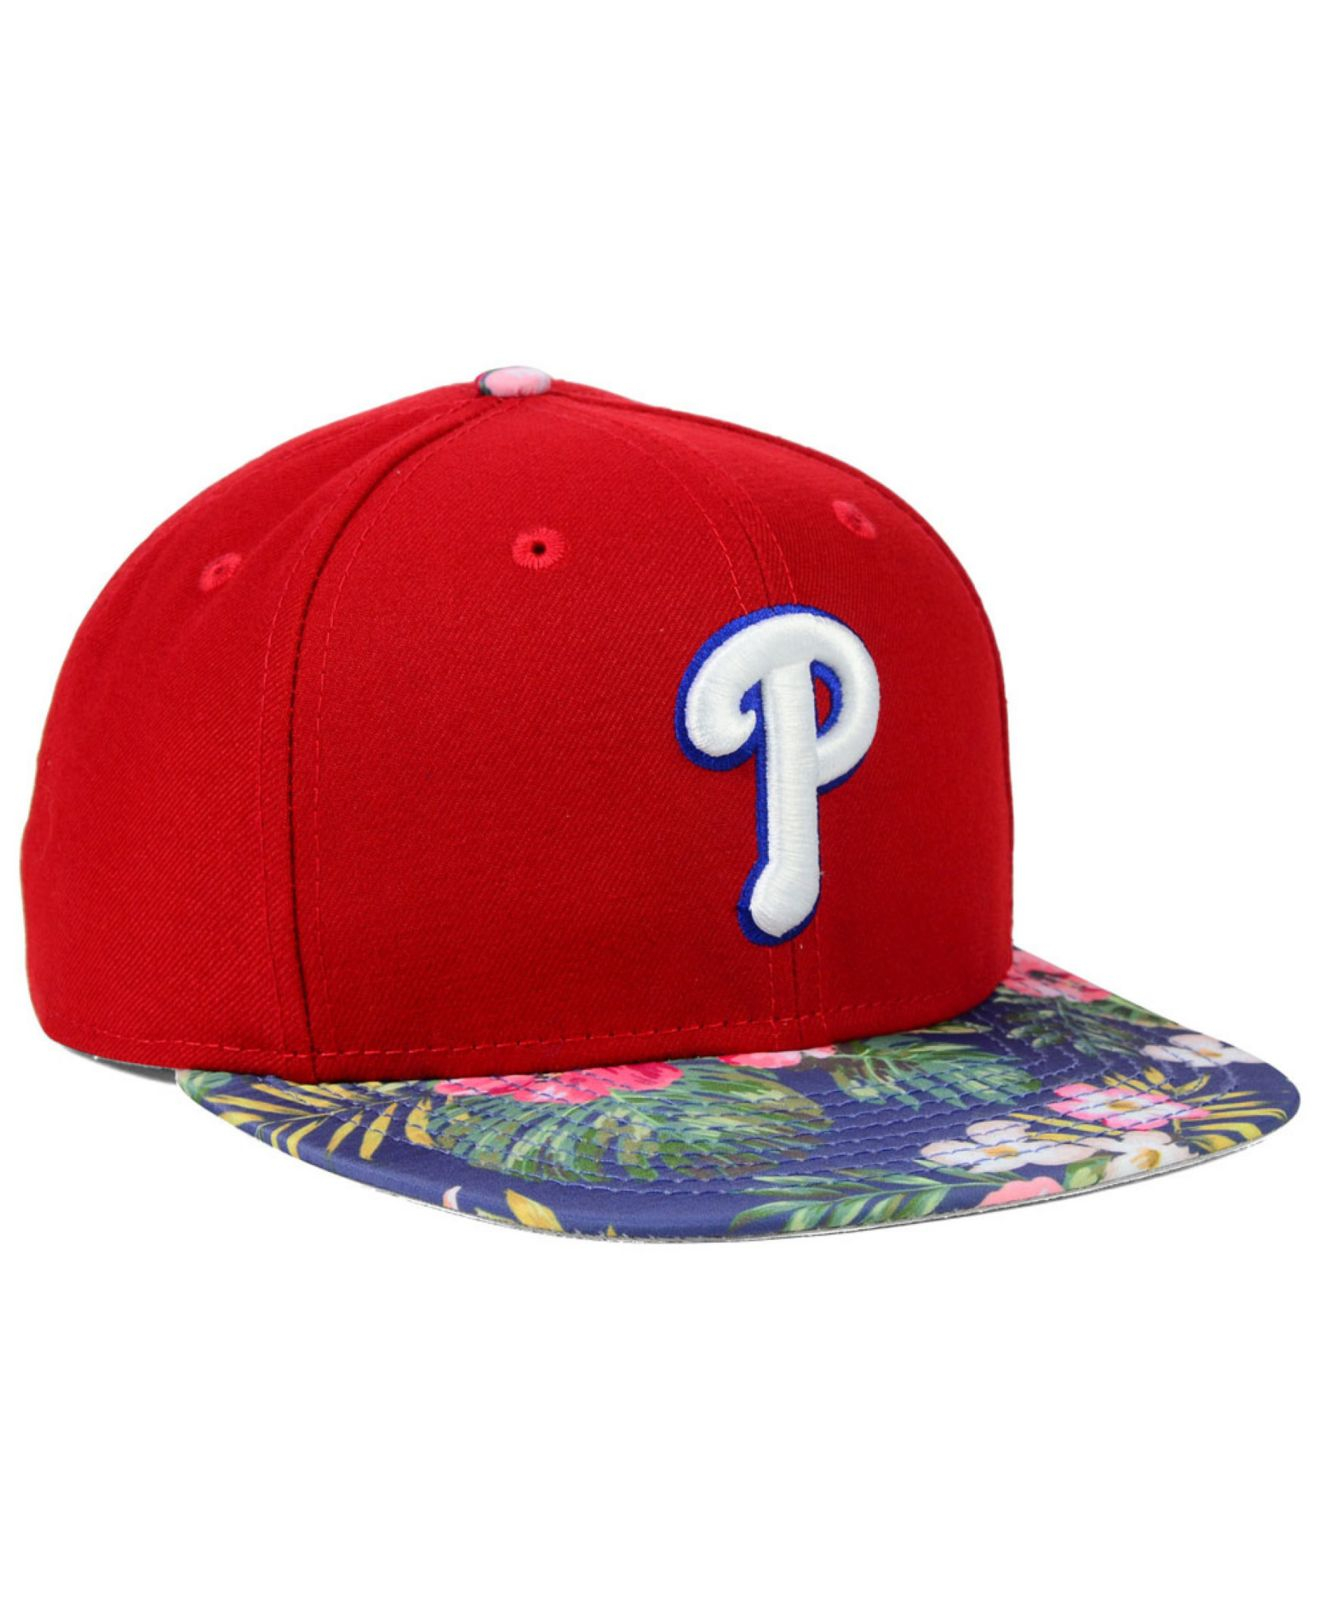 Lyst - KTZ Philadelphia Phillies Tropic Time 9fifty Snapback Cap in ... d4da3a031cfd